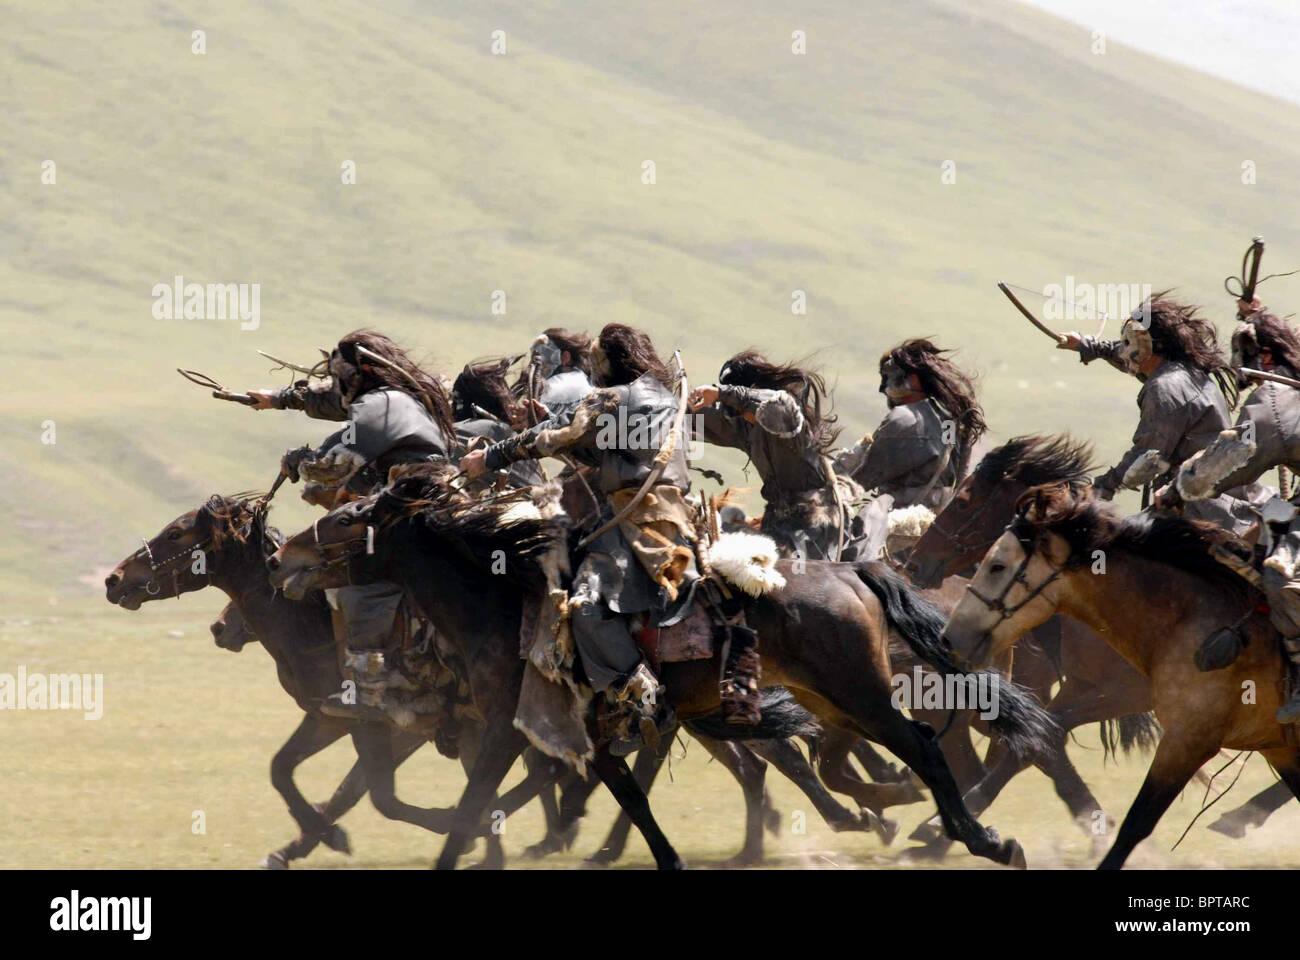 HORSEMEN CHARGE MONGOL (2007) Stock Photo